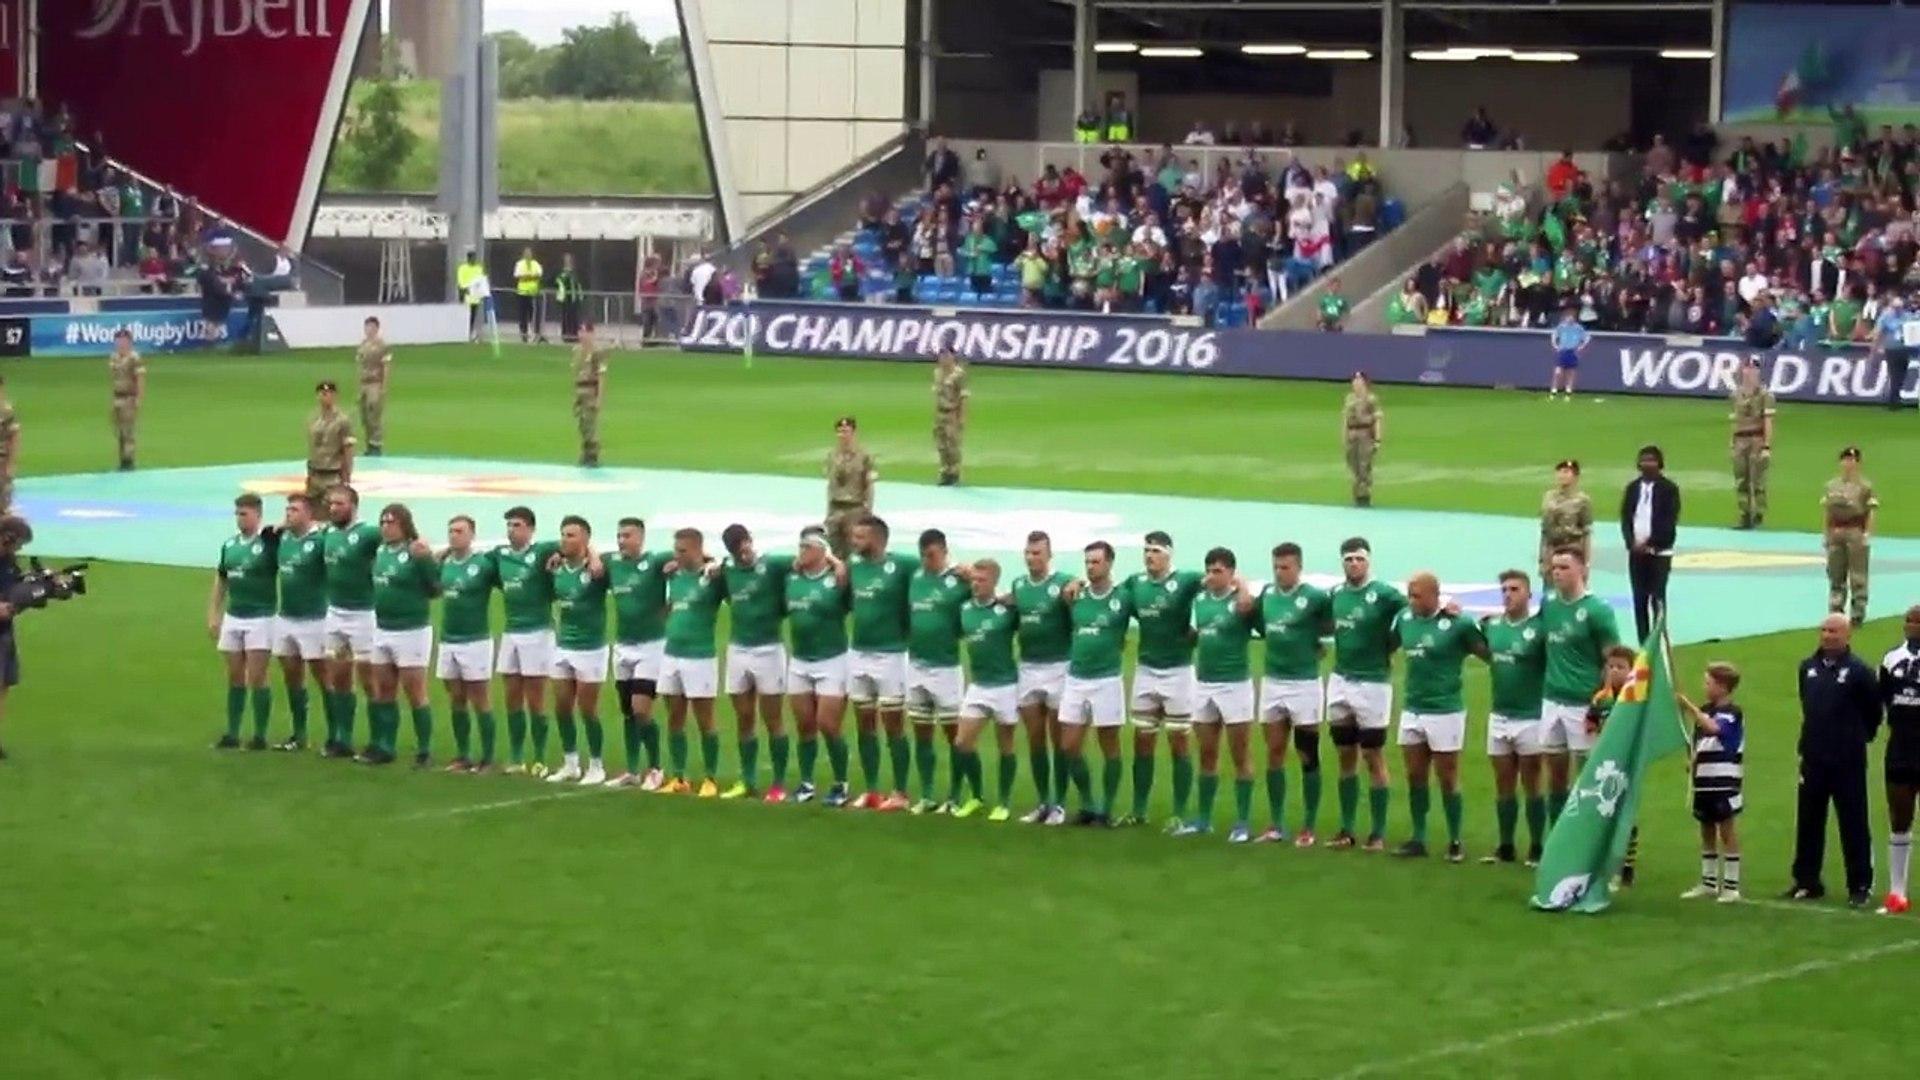 Under 20s Rugby World Cup Final-Irish National Anthem